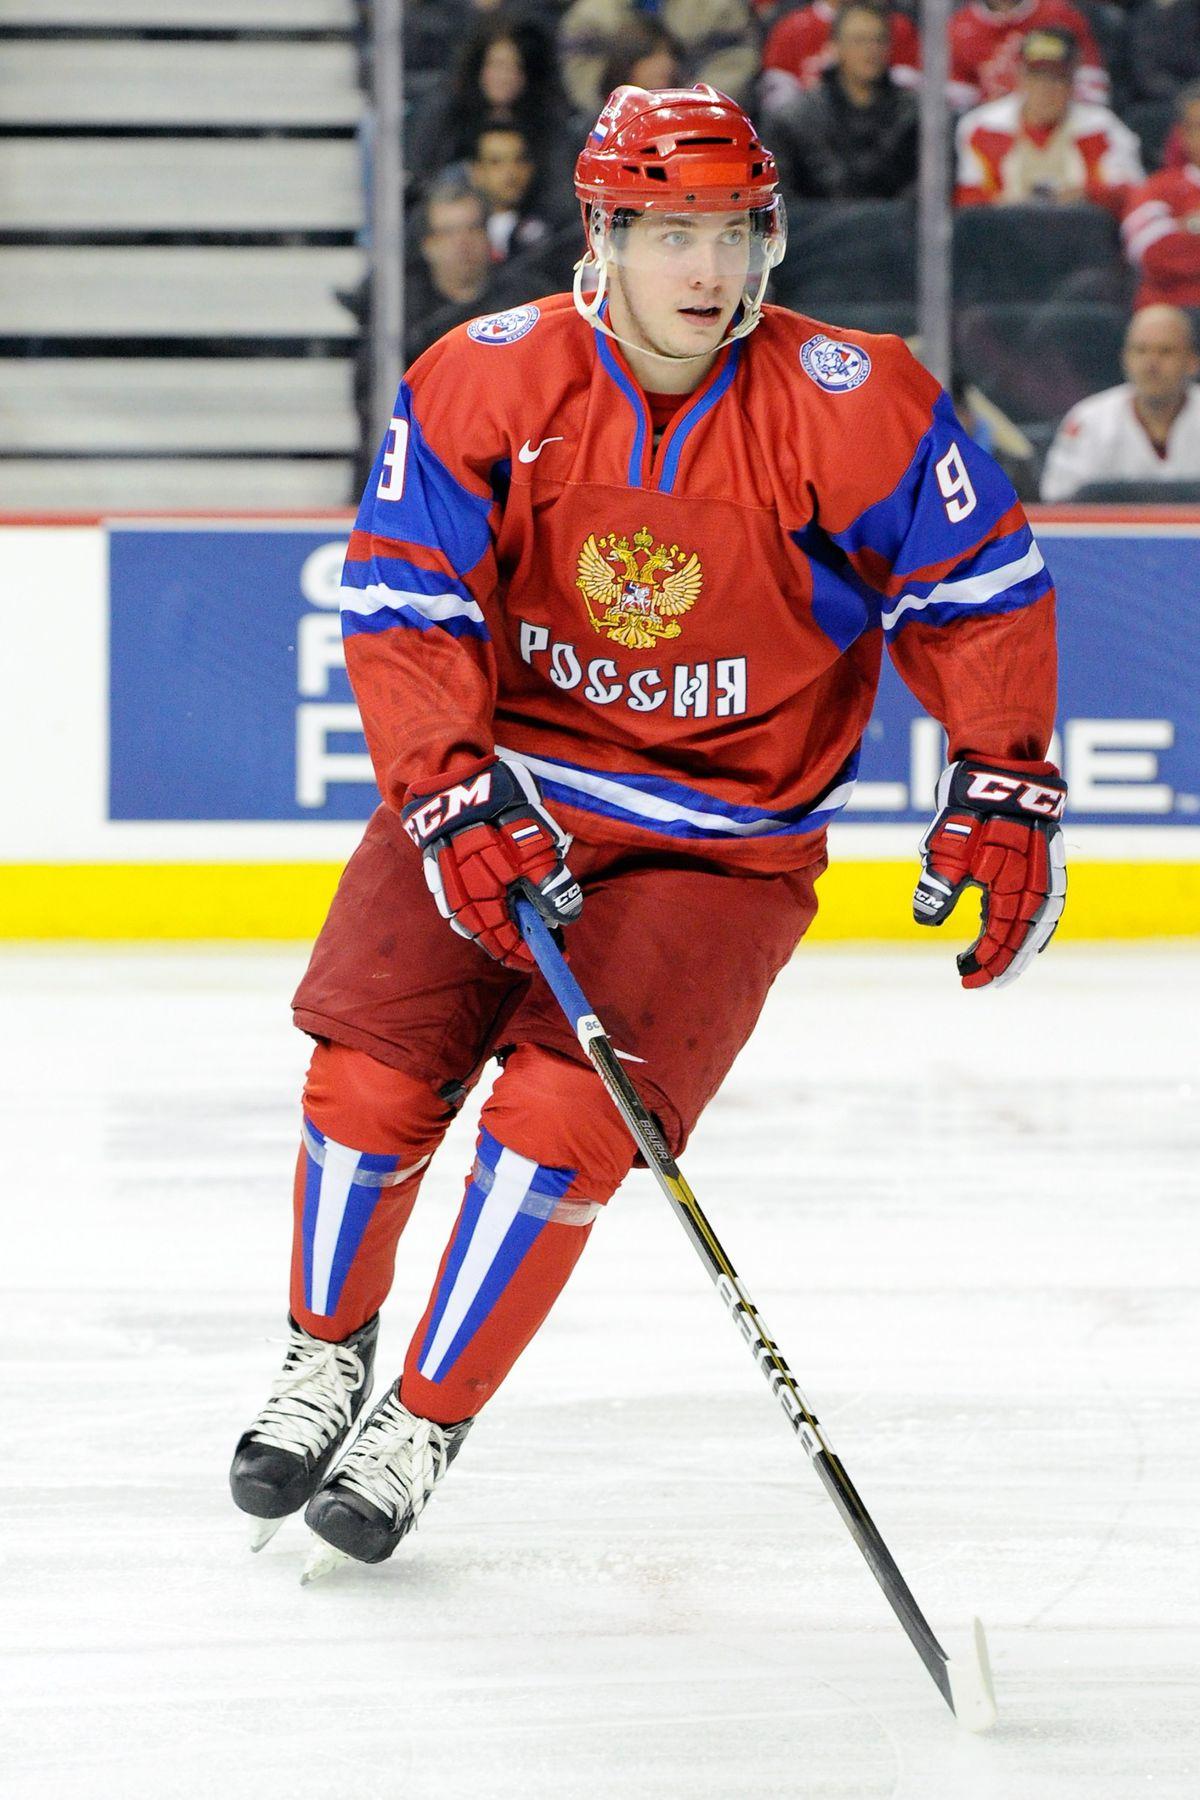 2012 World Junior Hockey Championships - Quarterfinal - Russia v Czech Republic